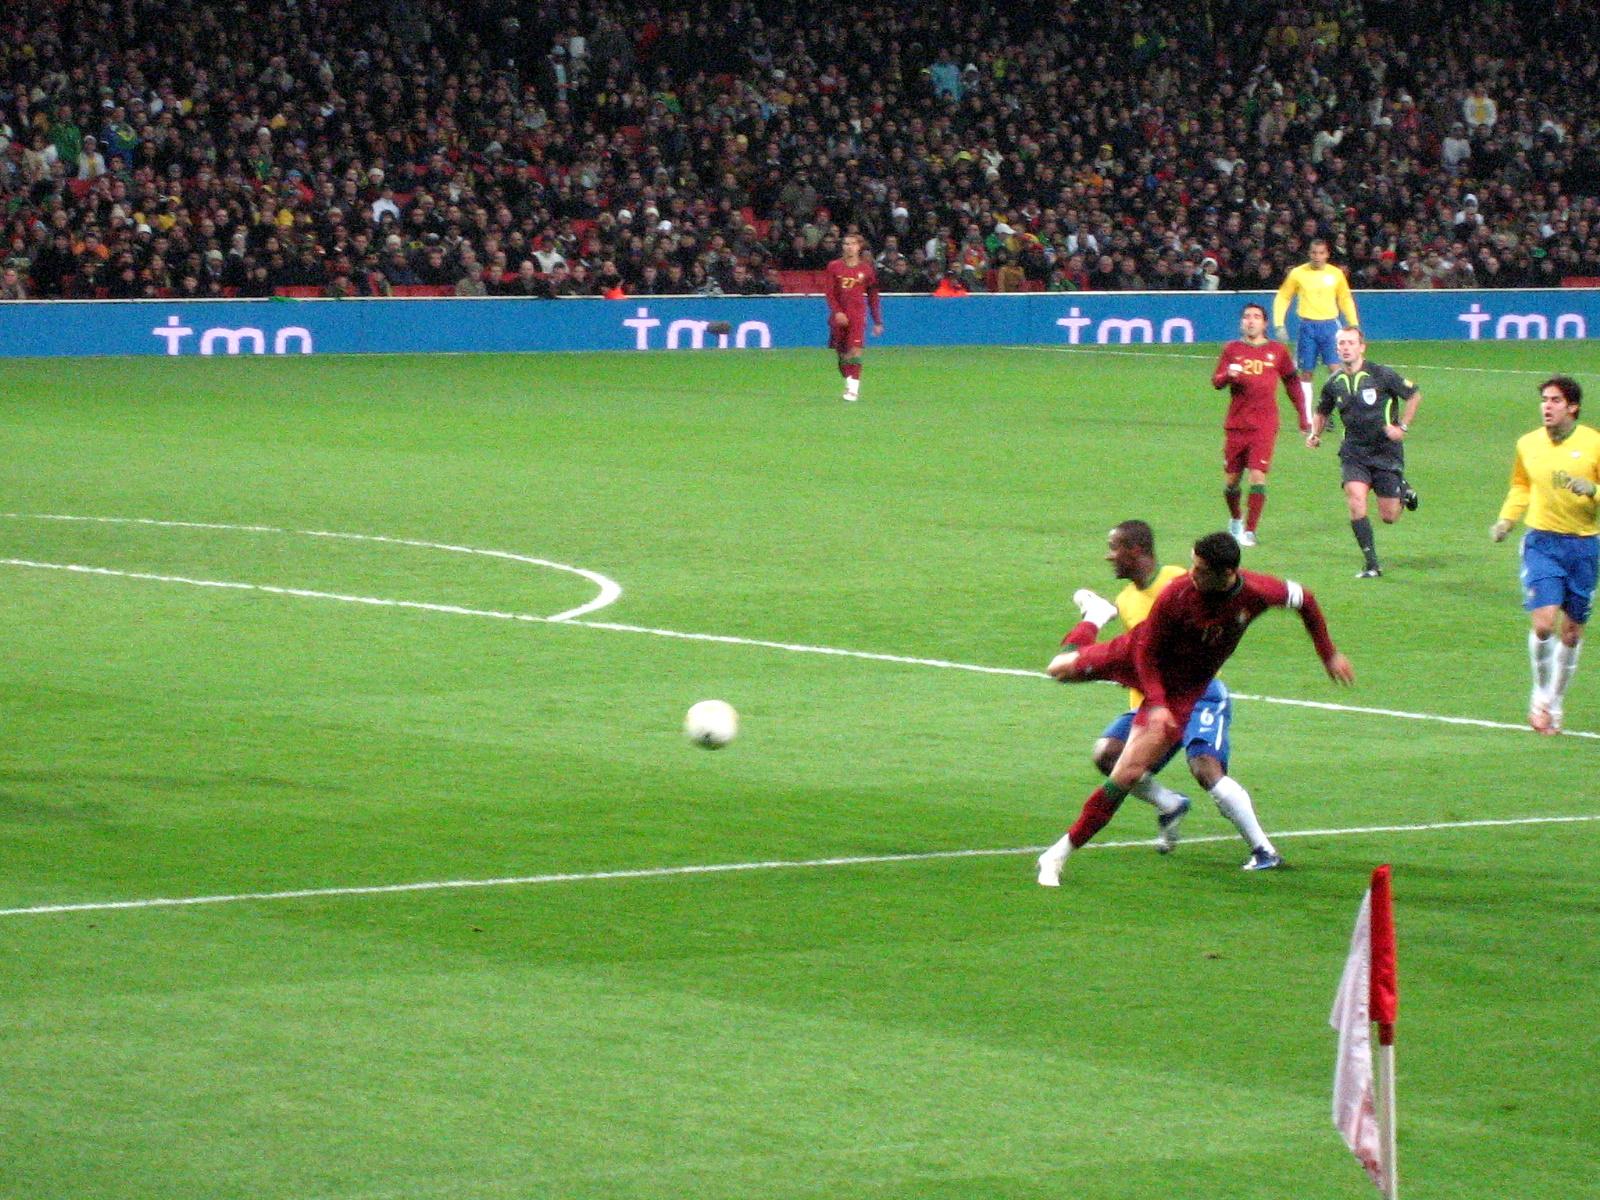 Campeonato do Mundo da FIFA de 2006 b65c8401bb158